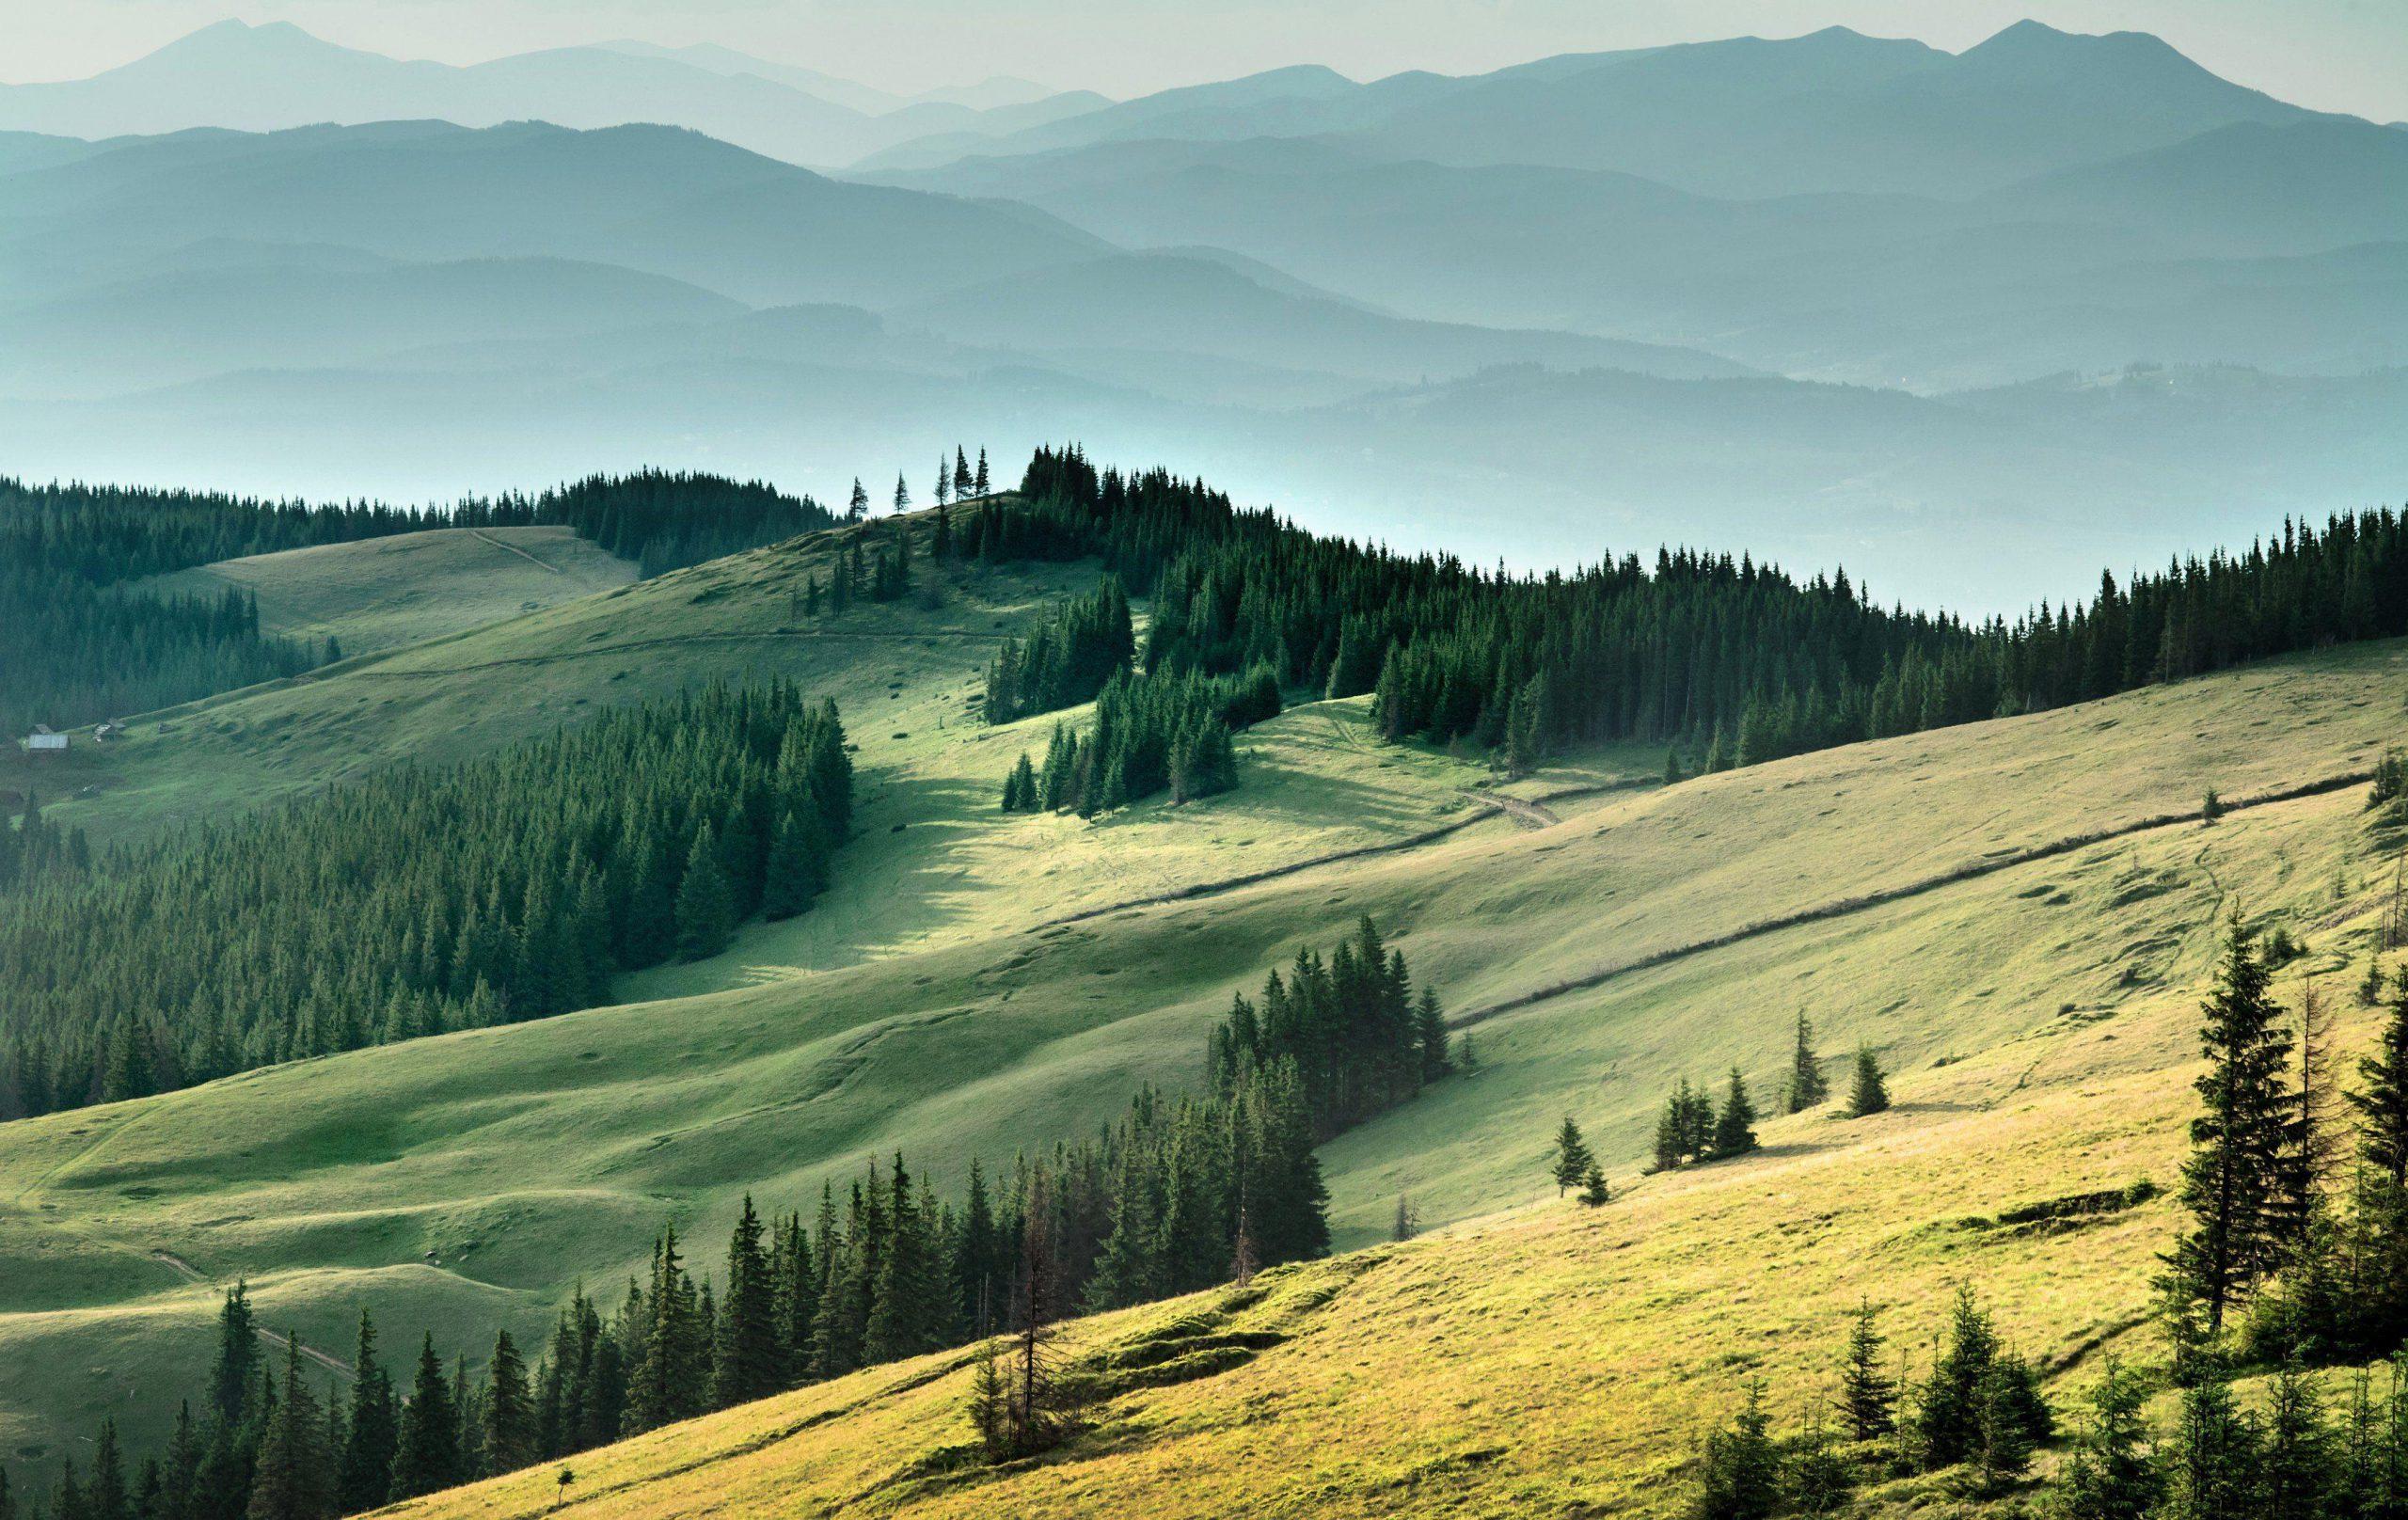 Ukraine Backgrounds